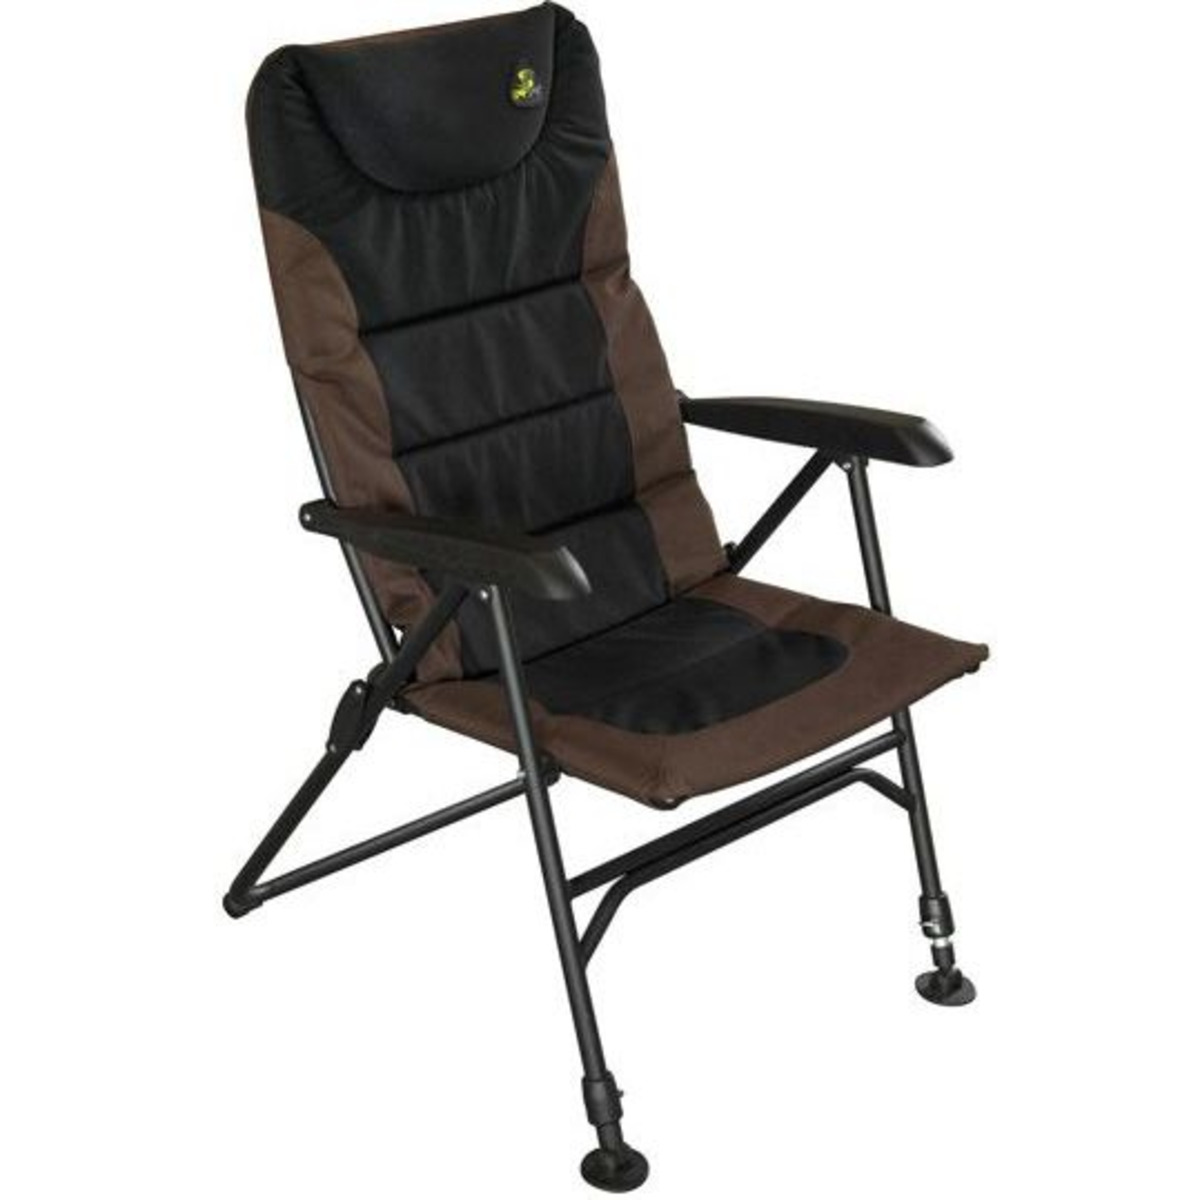 Carp Spirit Stuhl Relax - XL - 5.80 kg - 180x60x40 cm